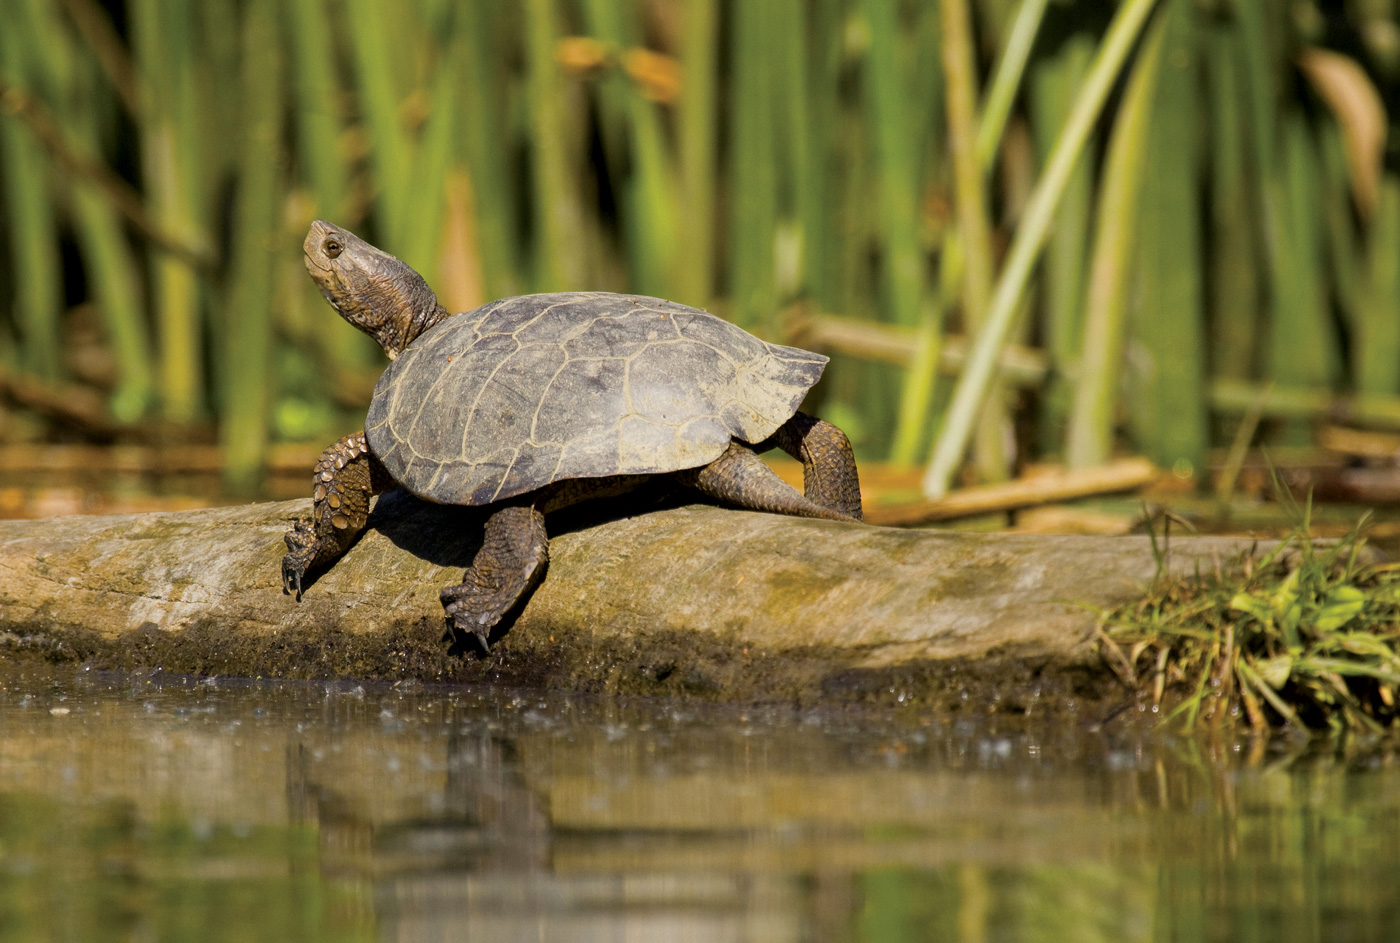 112715_Inpost_Turtle_01